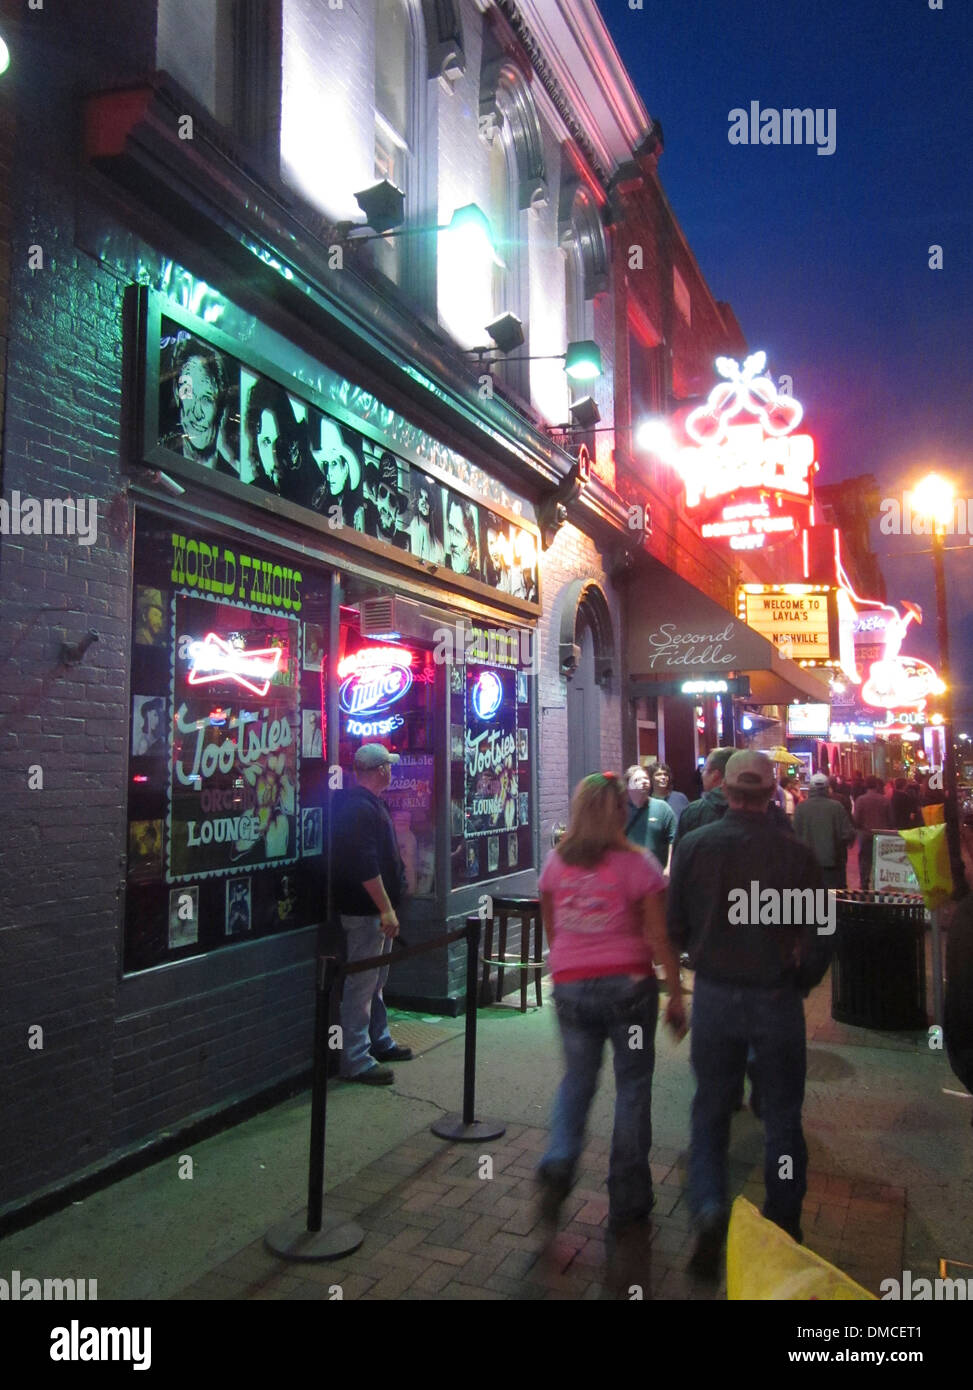 Exterior y gorila de Tootsie's Orchid Lounge, un famoso bar Honky Tonk en Broadway en el centro de Nashville, Tennessee. Imagen De Stock